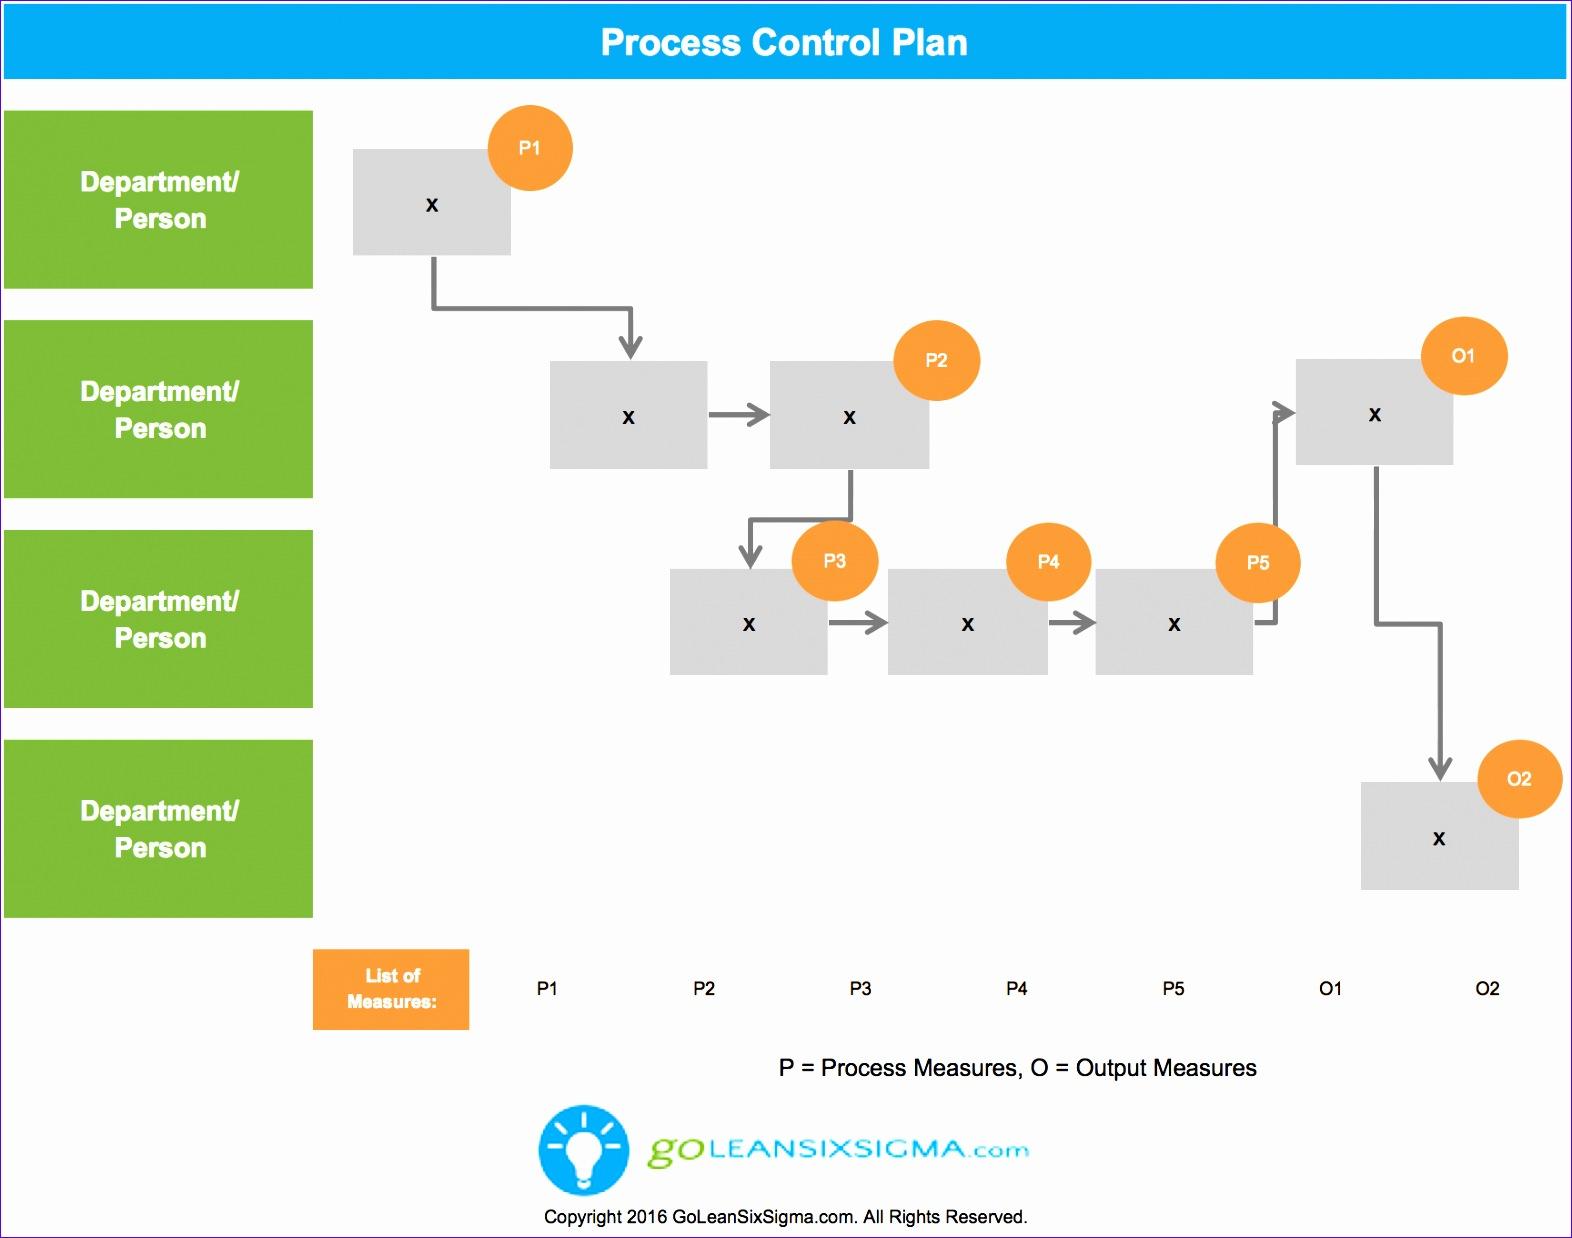 Process Control Plan v3 0 GoLeanSixSigma